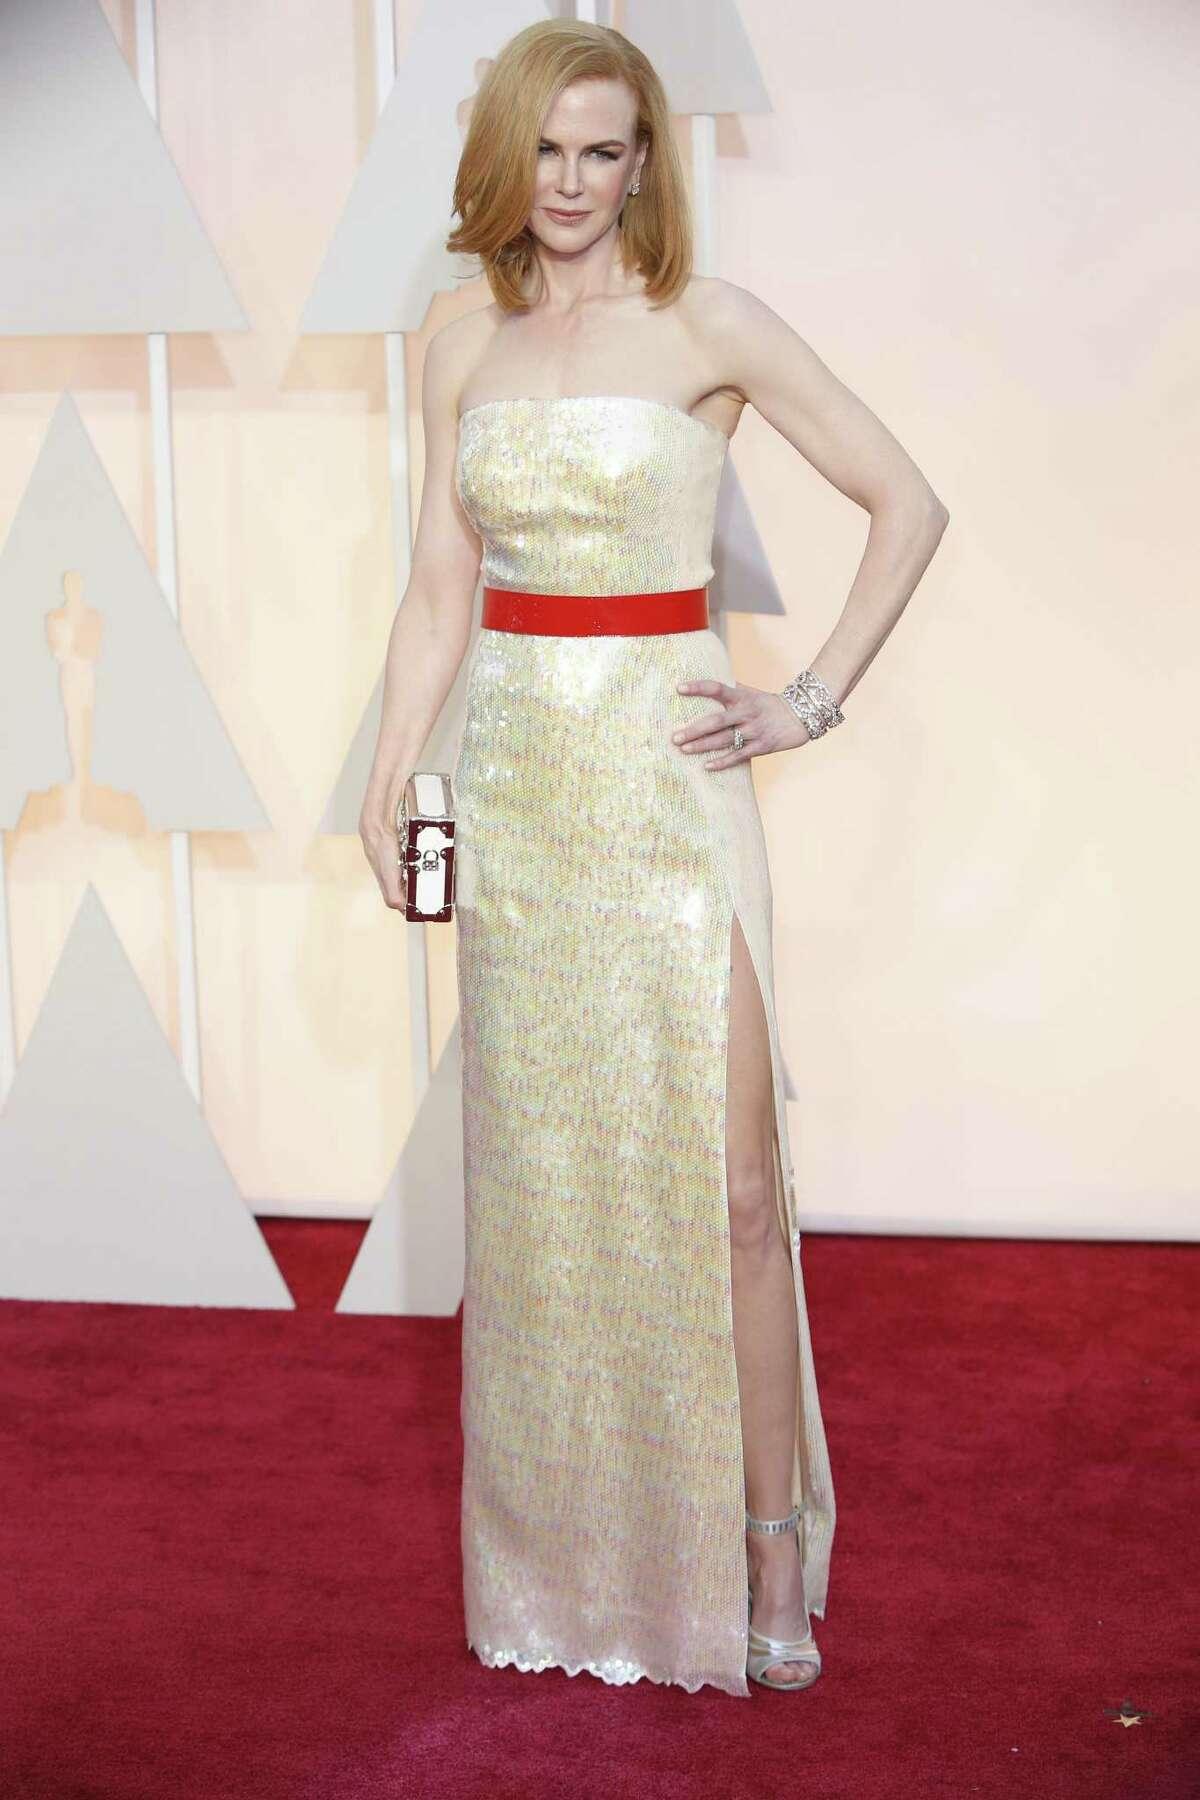 Nicole Kidman Looks Really Good in Altuzarra - Go Fug Yourself